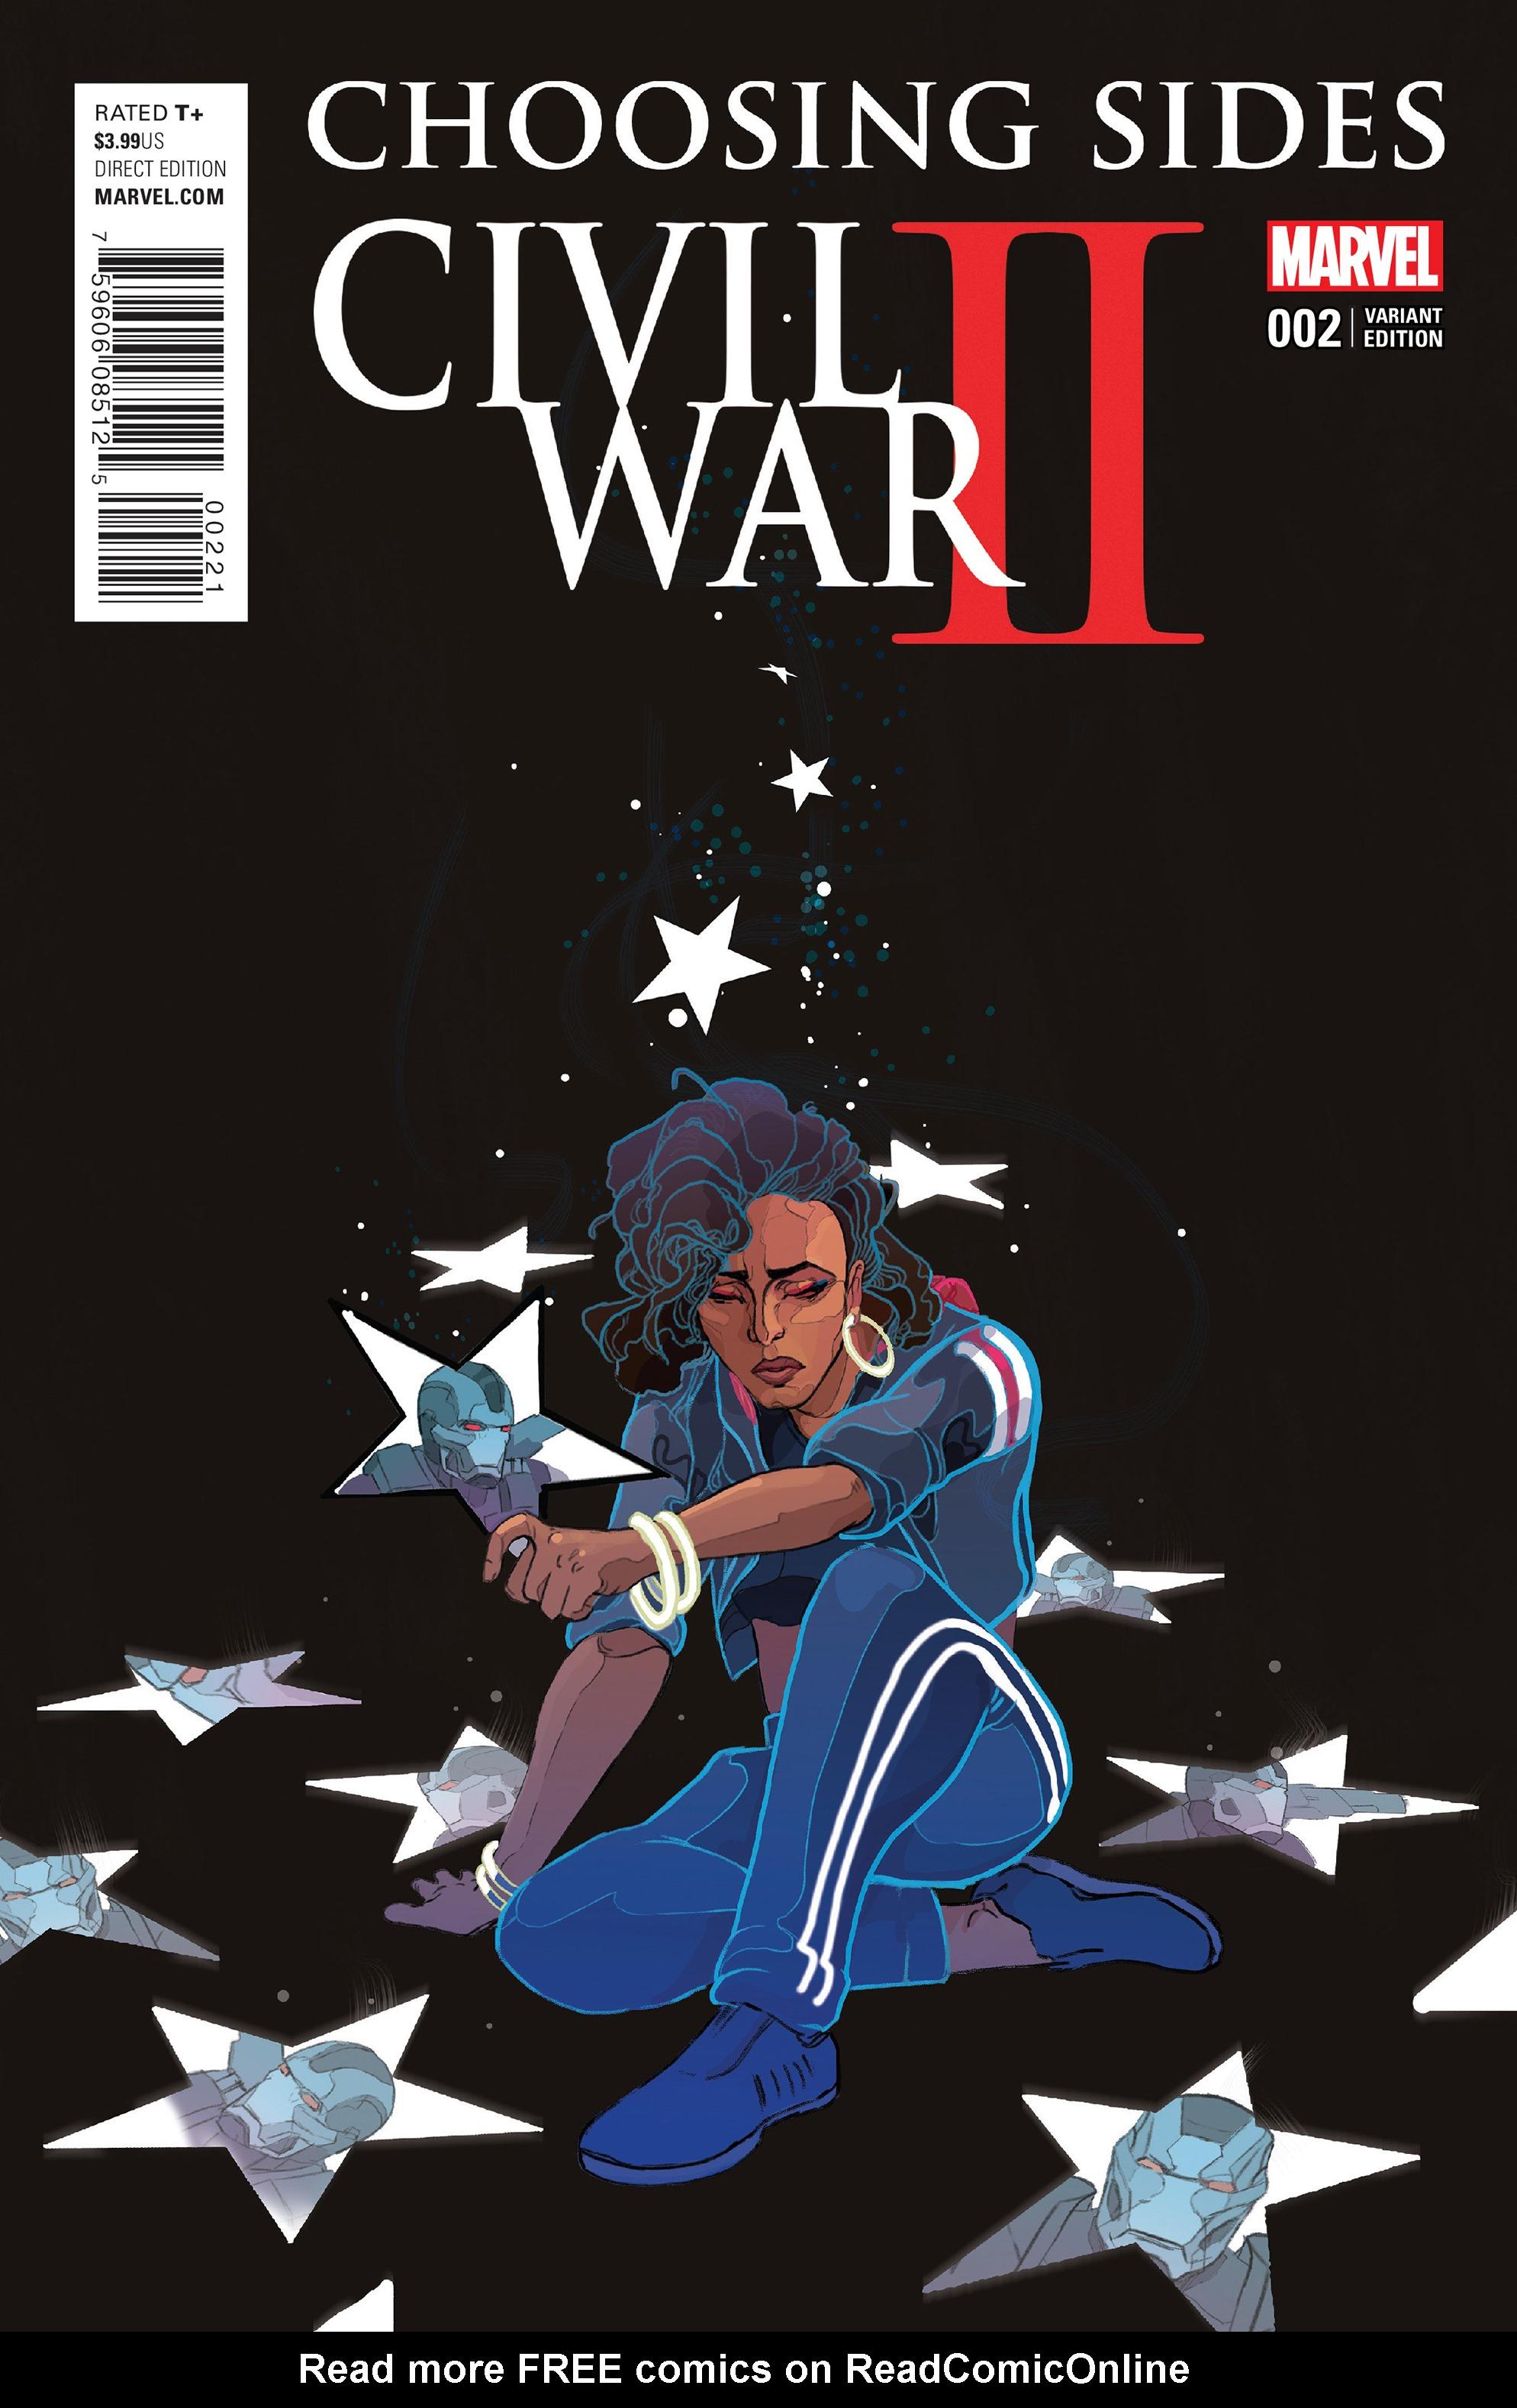 Read online Civil War II: Choosing Sides comic -  Issue #2 - 3